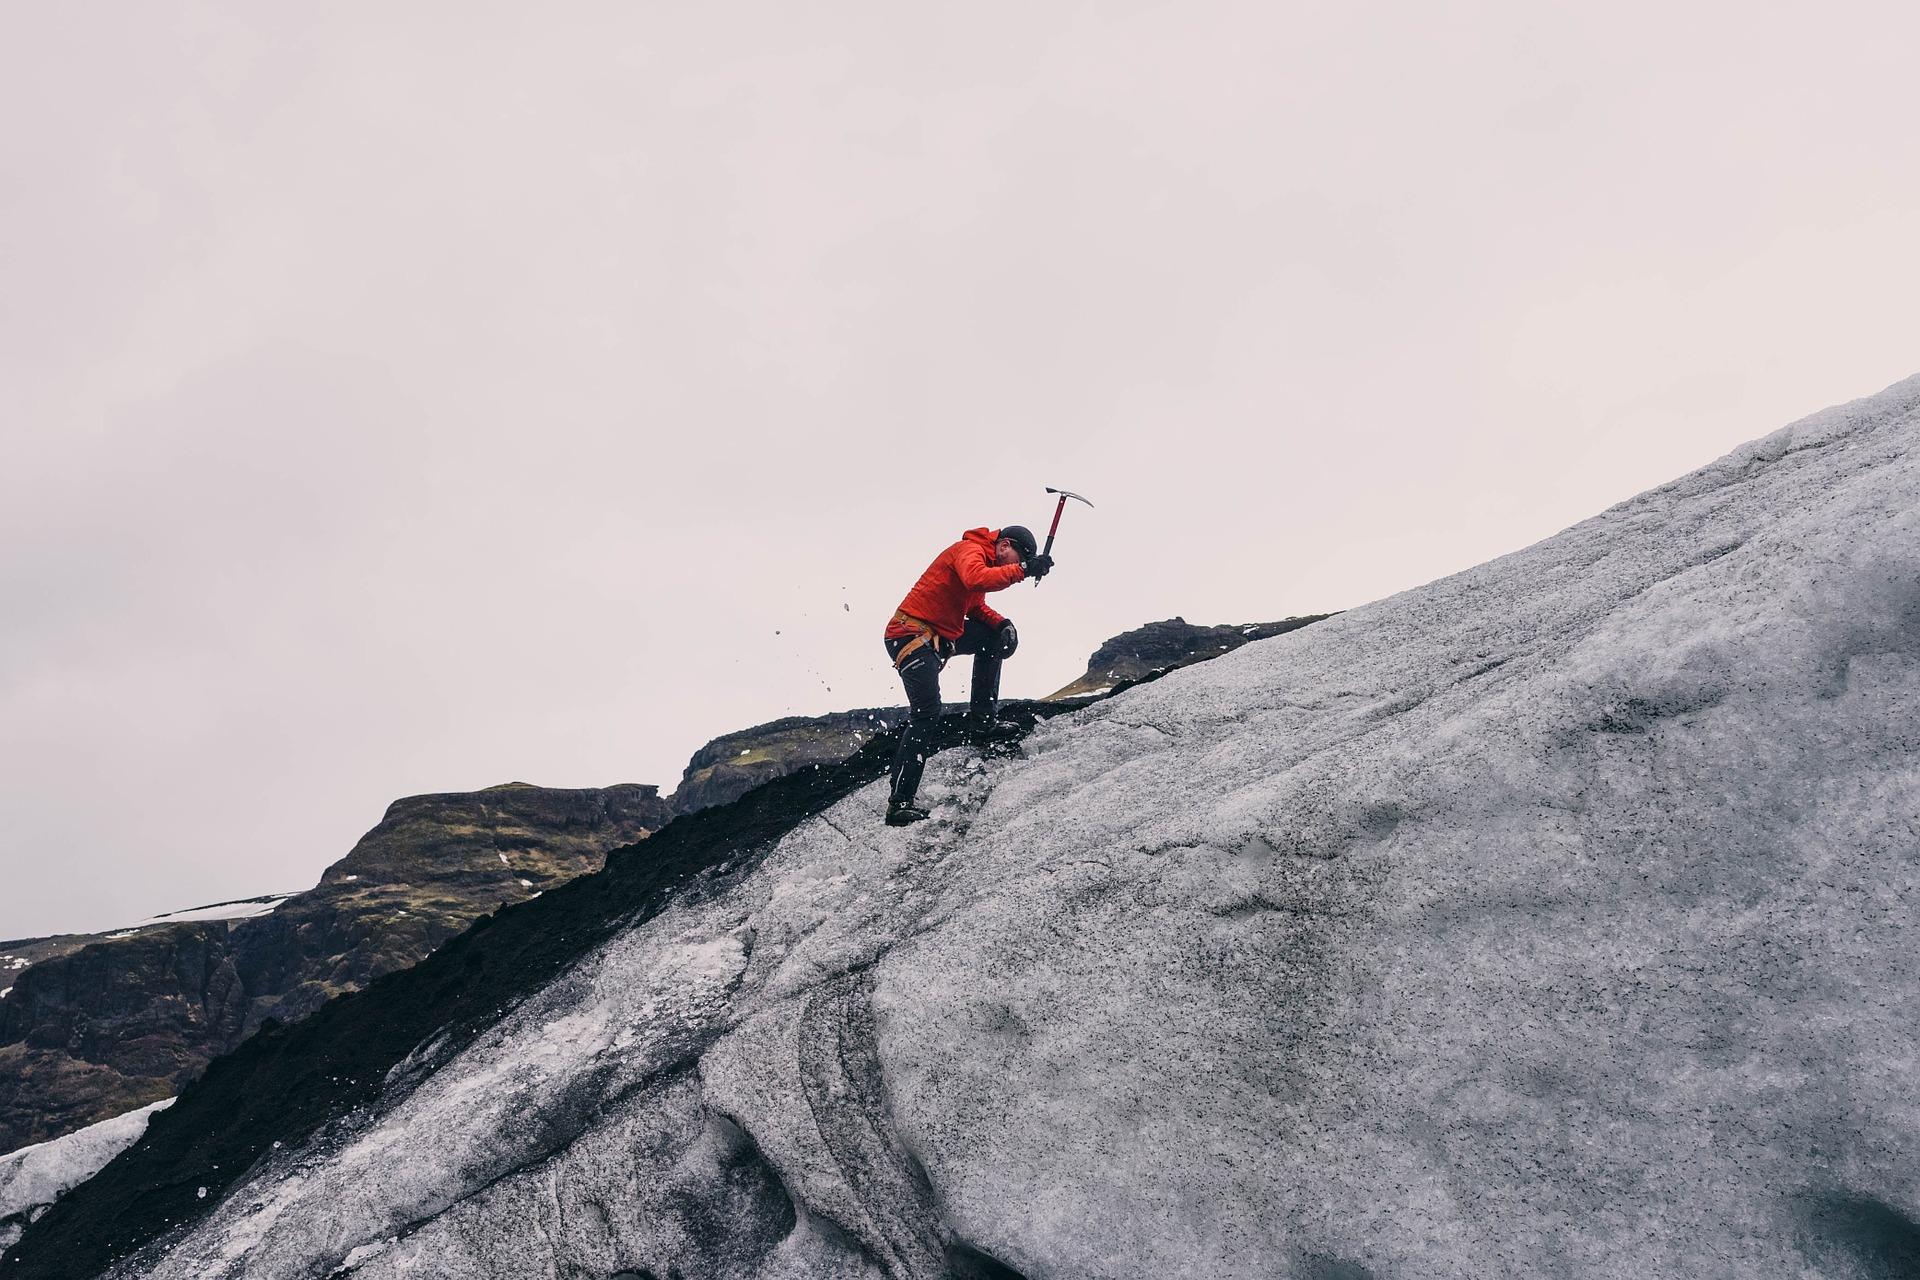 mountain-climbing-802099_1920.jpg